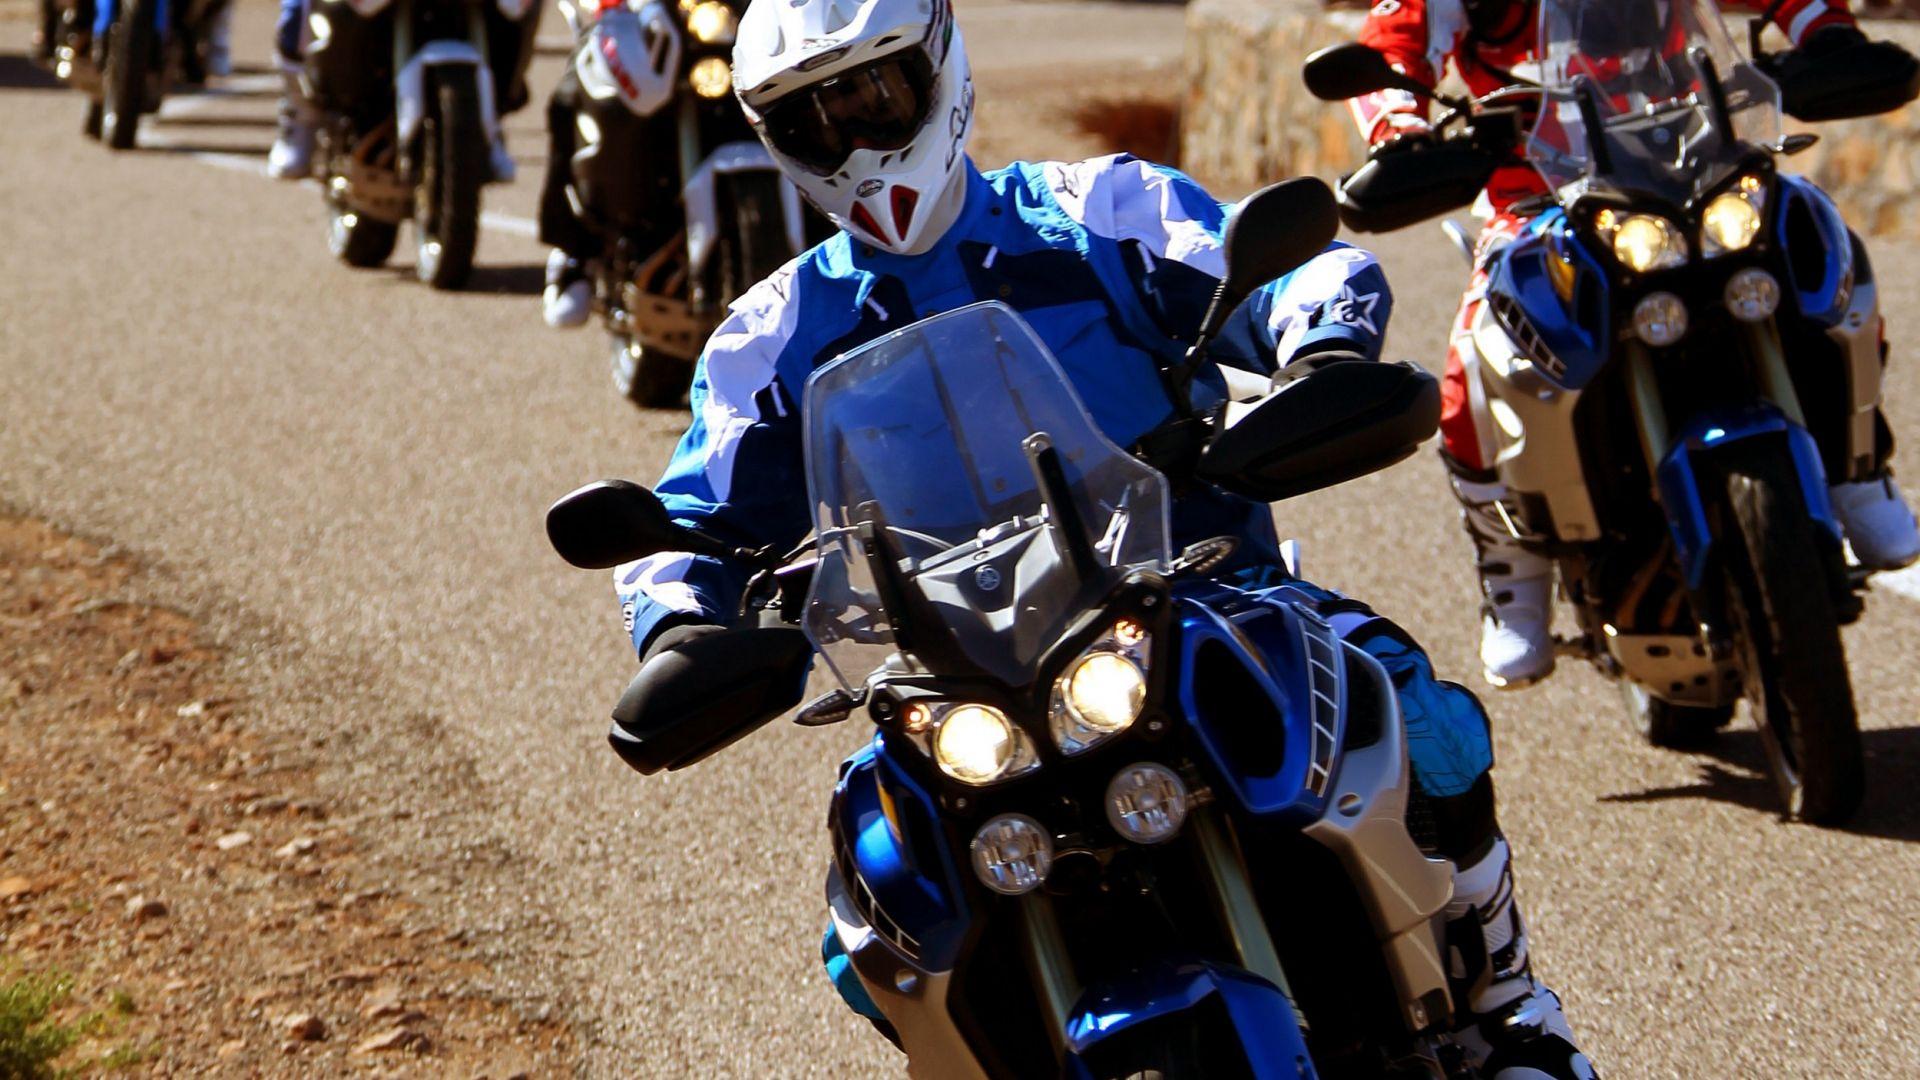 Immagine 43: In Marocco con la Yamaha Super Ténéré